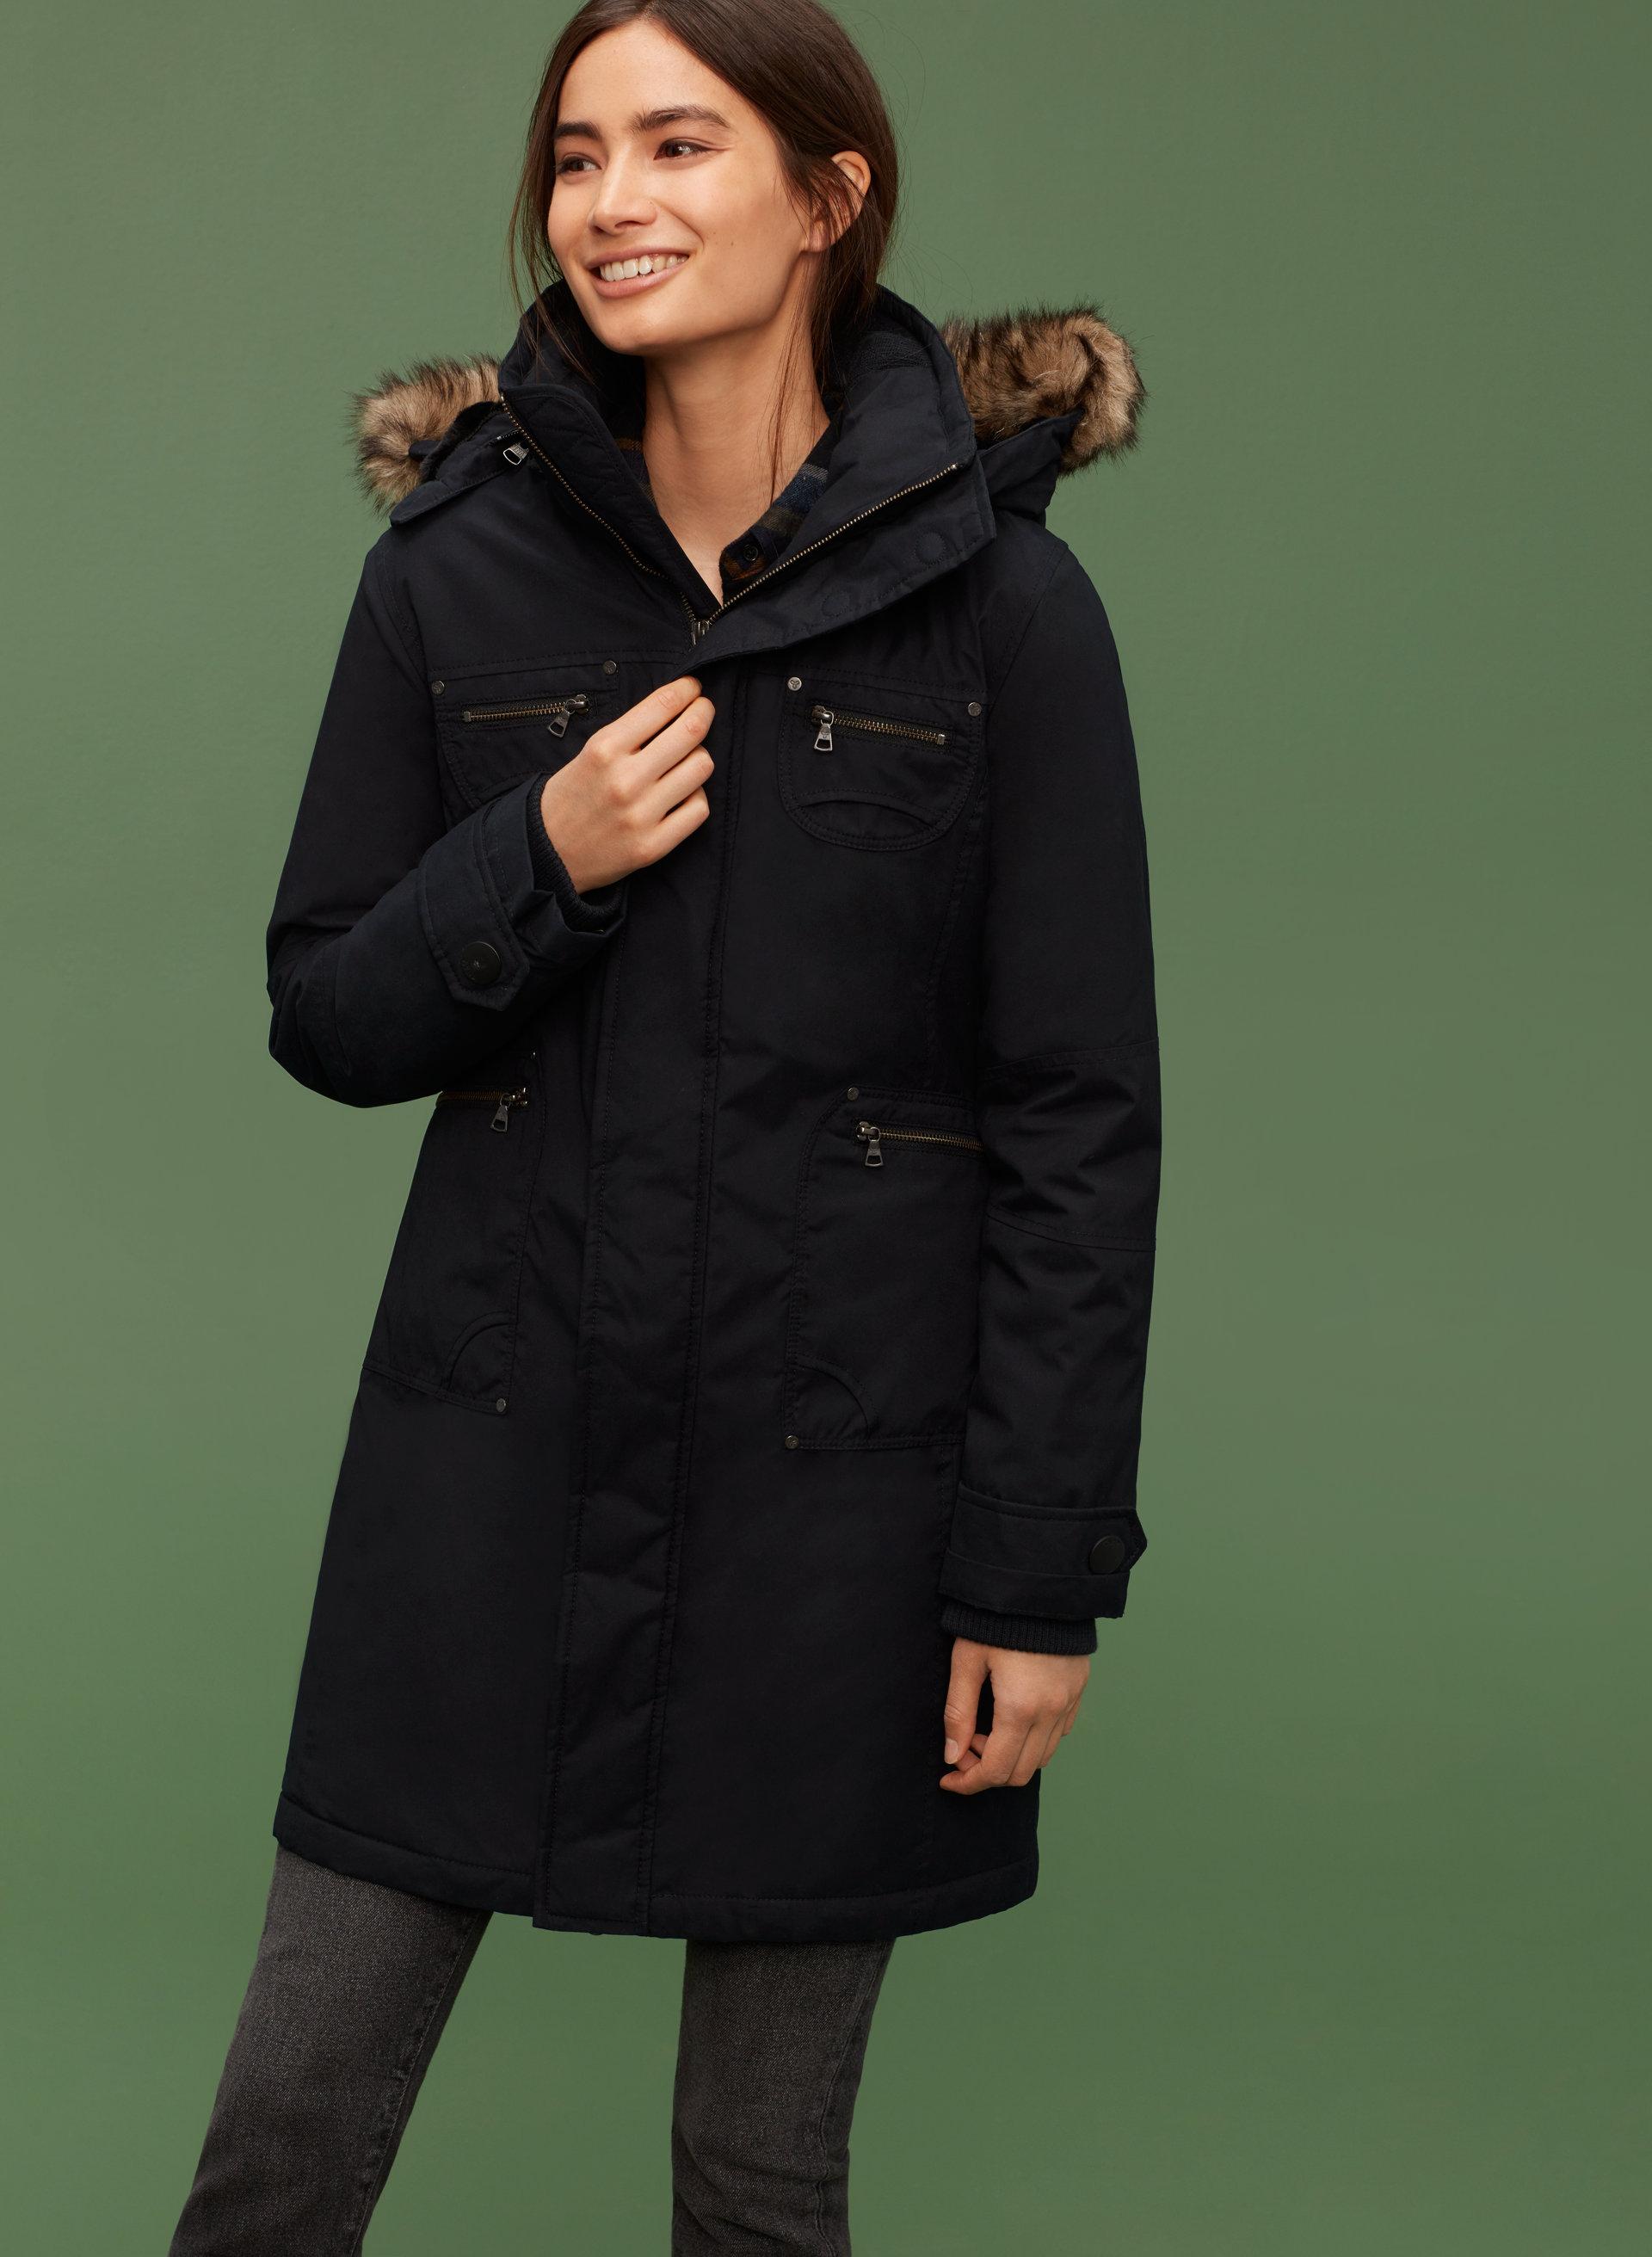 Tna black parka jacket